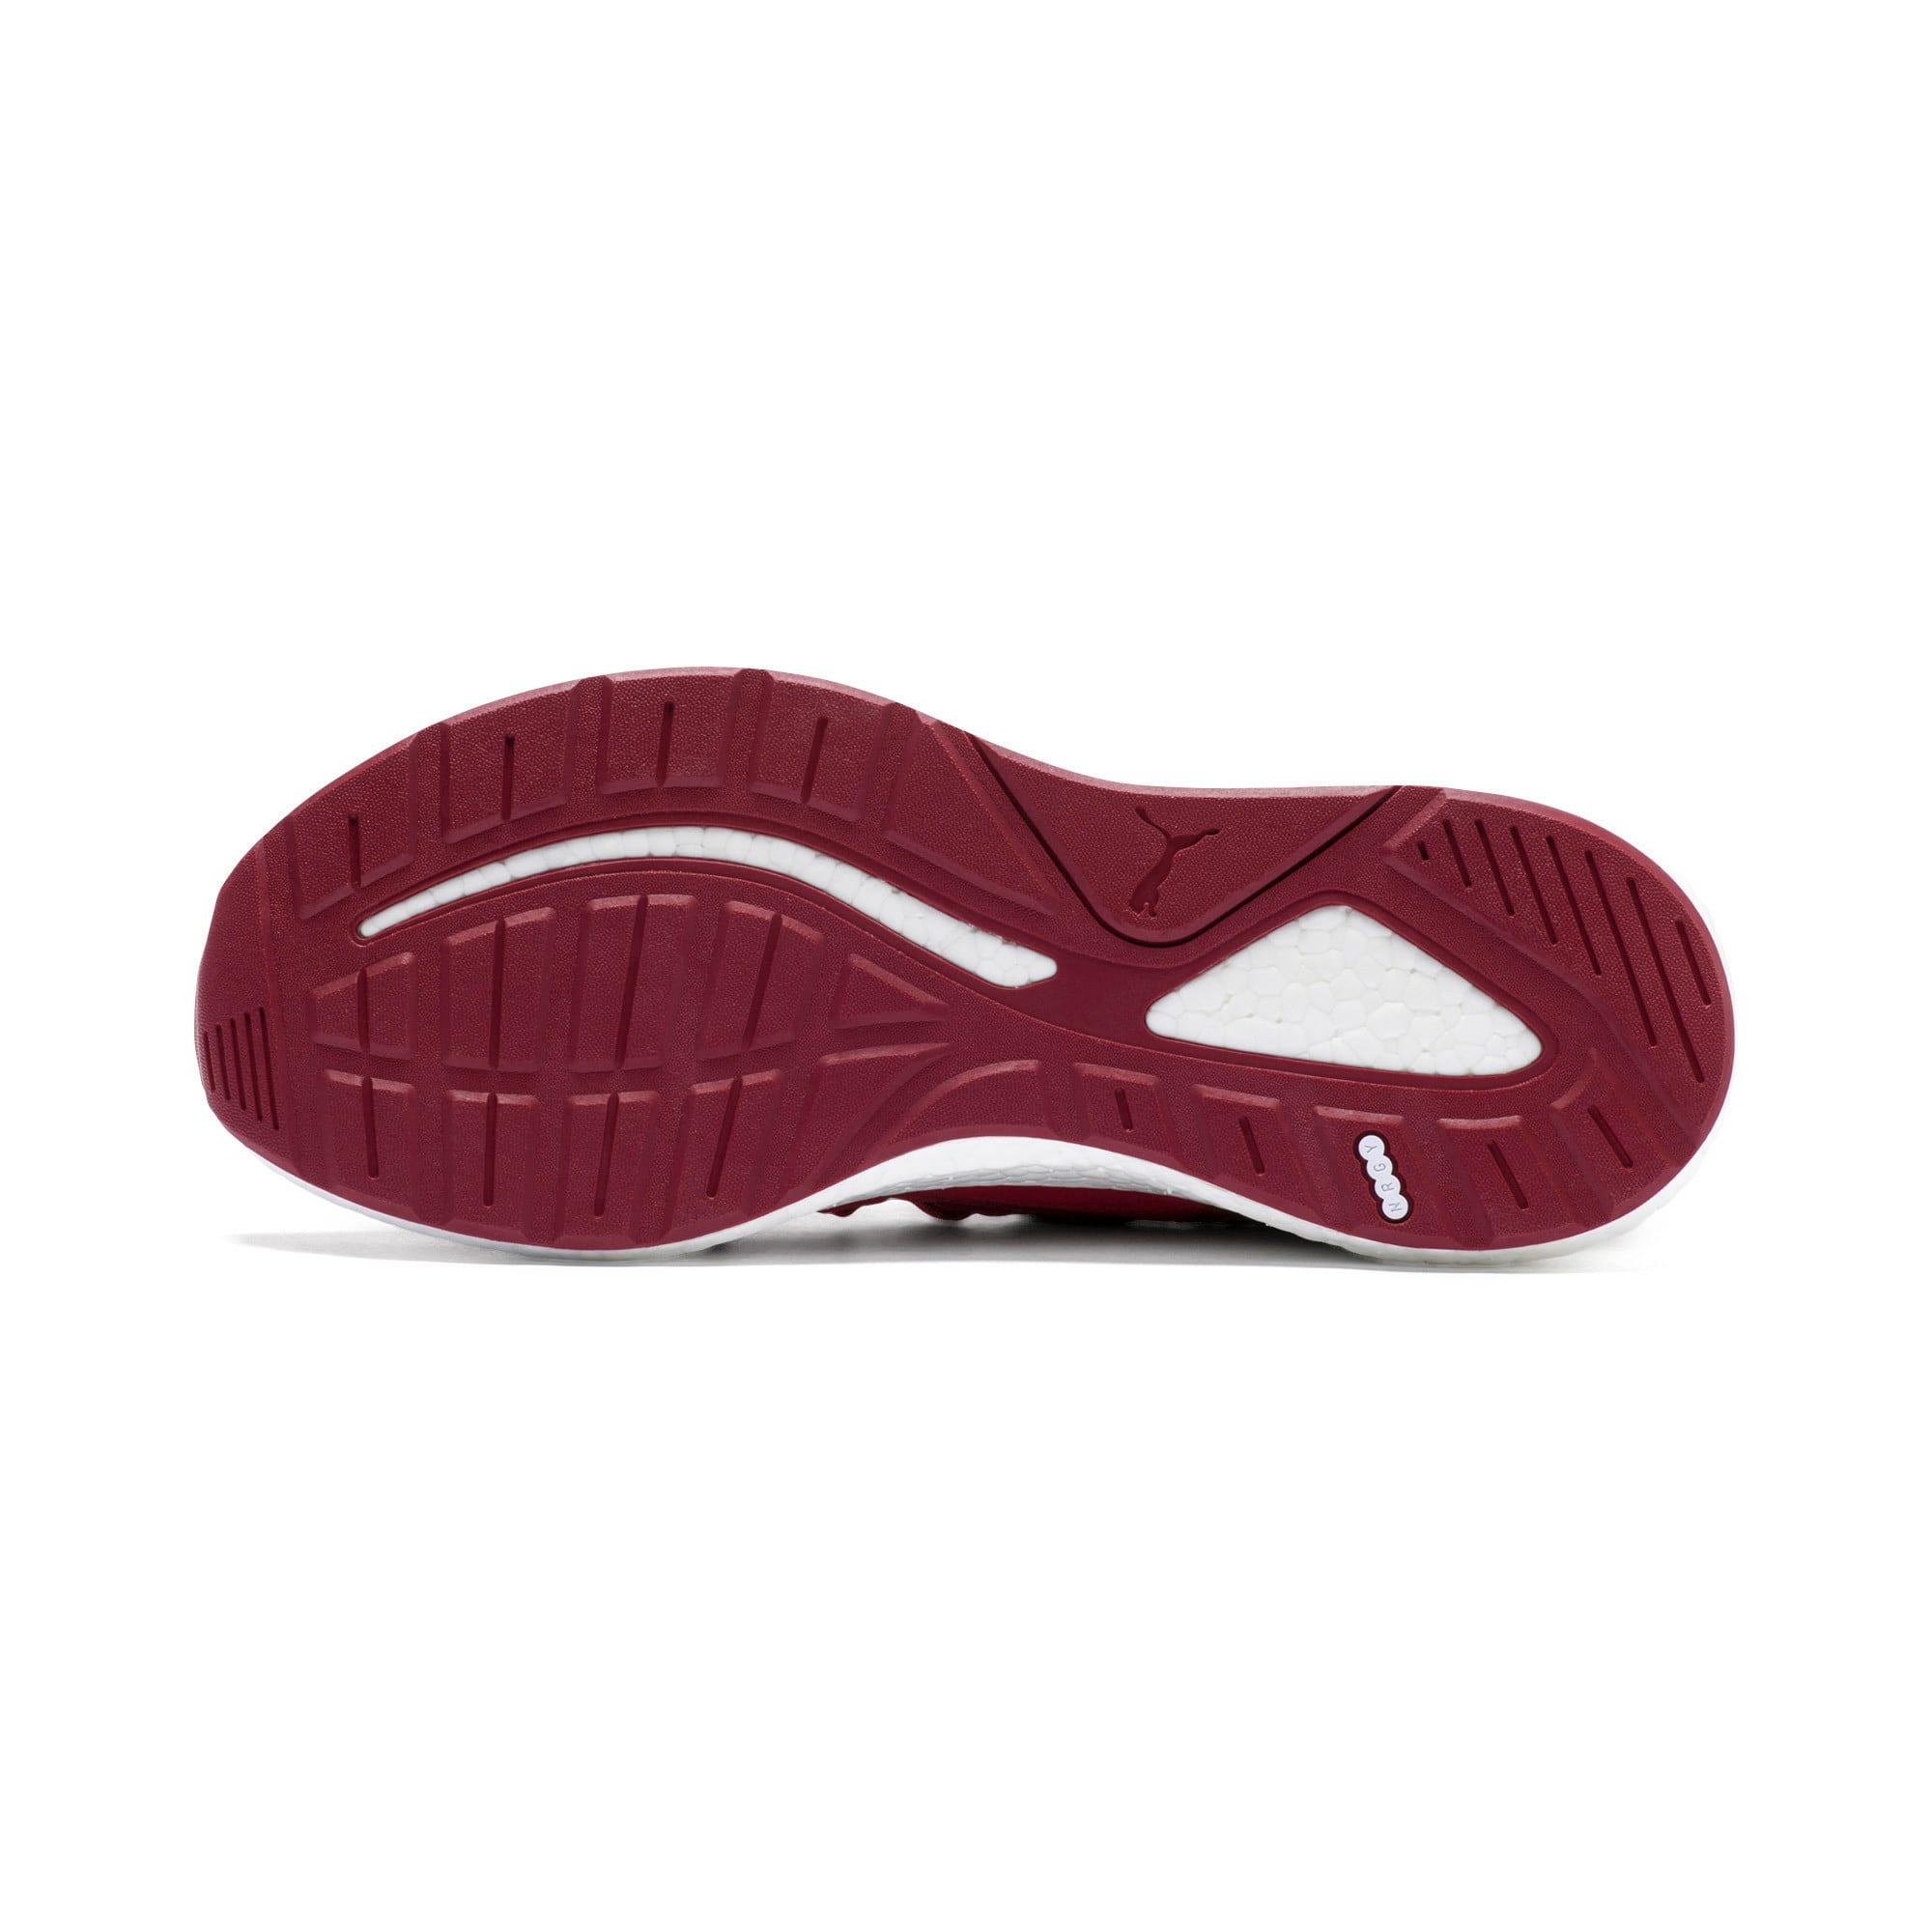 Thumbnail 3 of NRGY Neko VT Women's Running Shoes, Pomegranate-Metallic Gold, medium